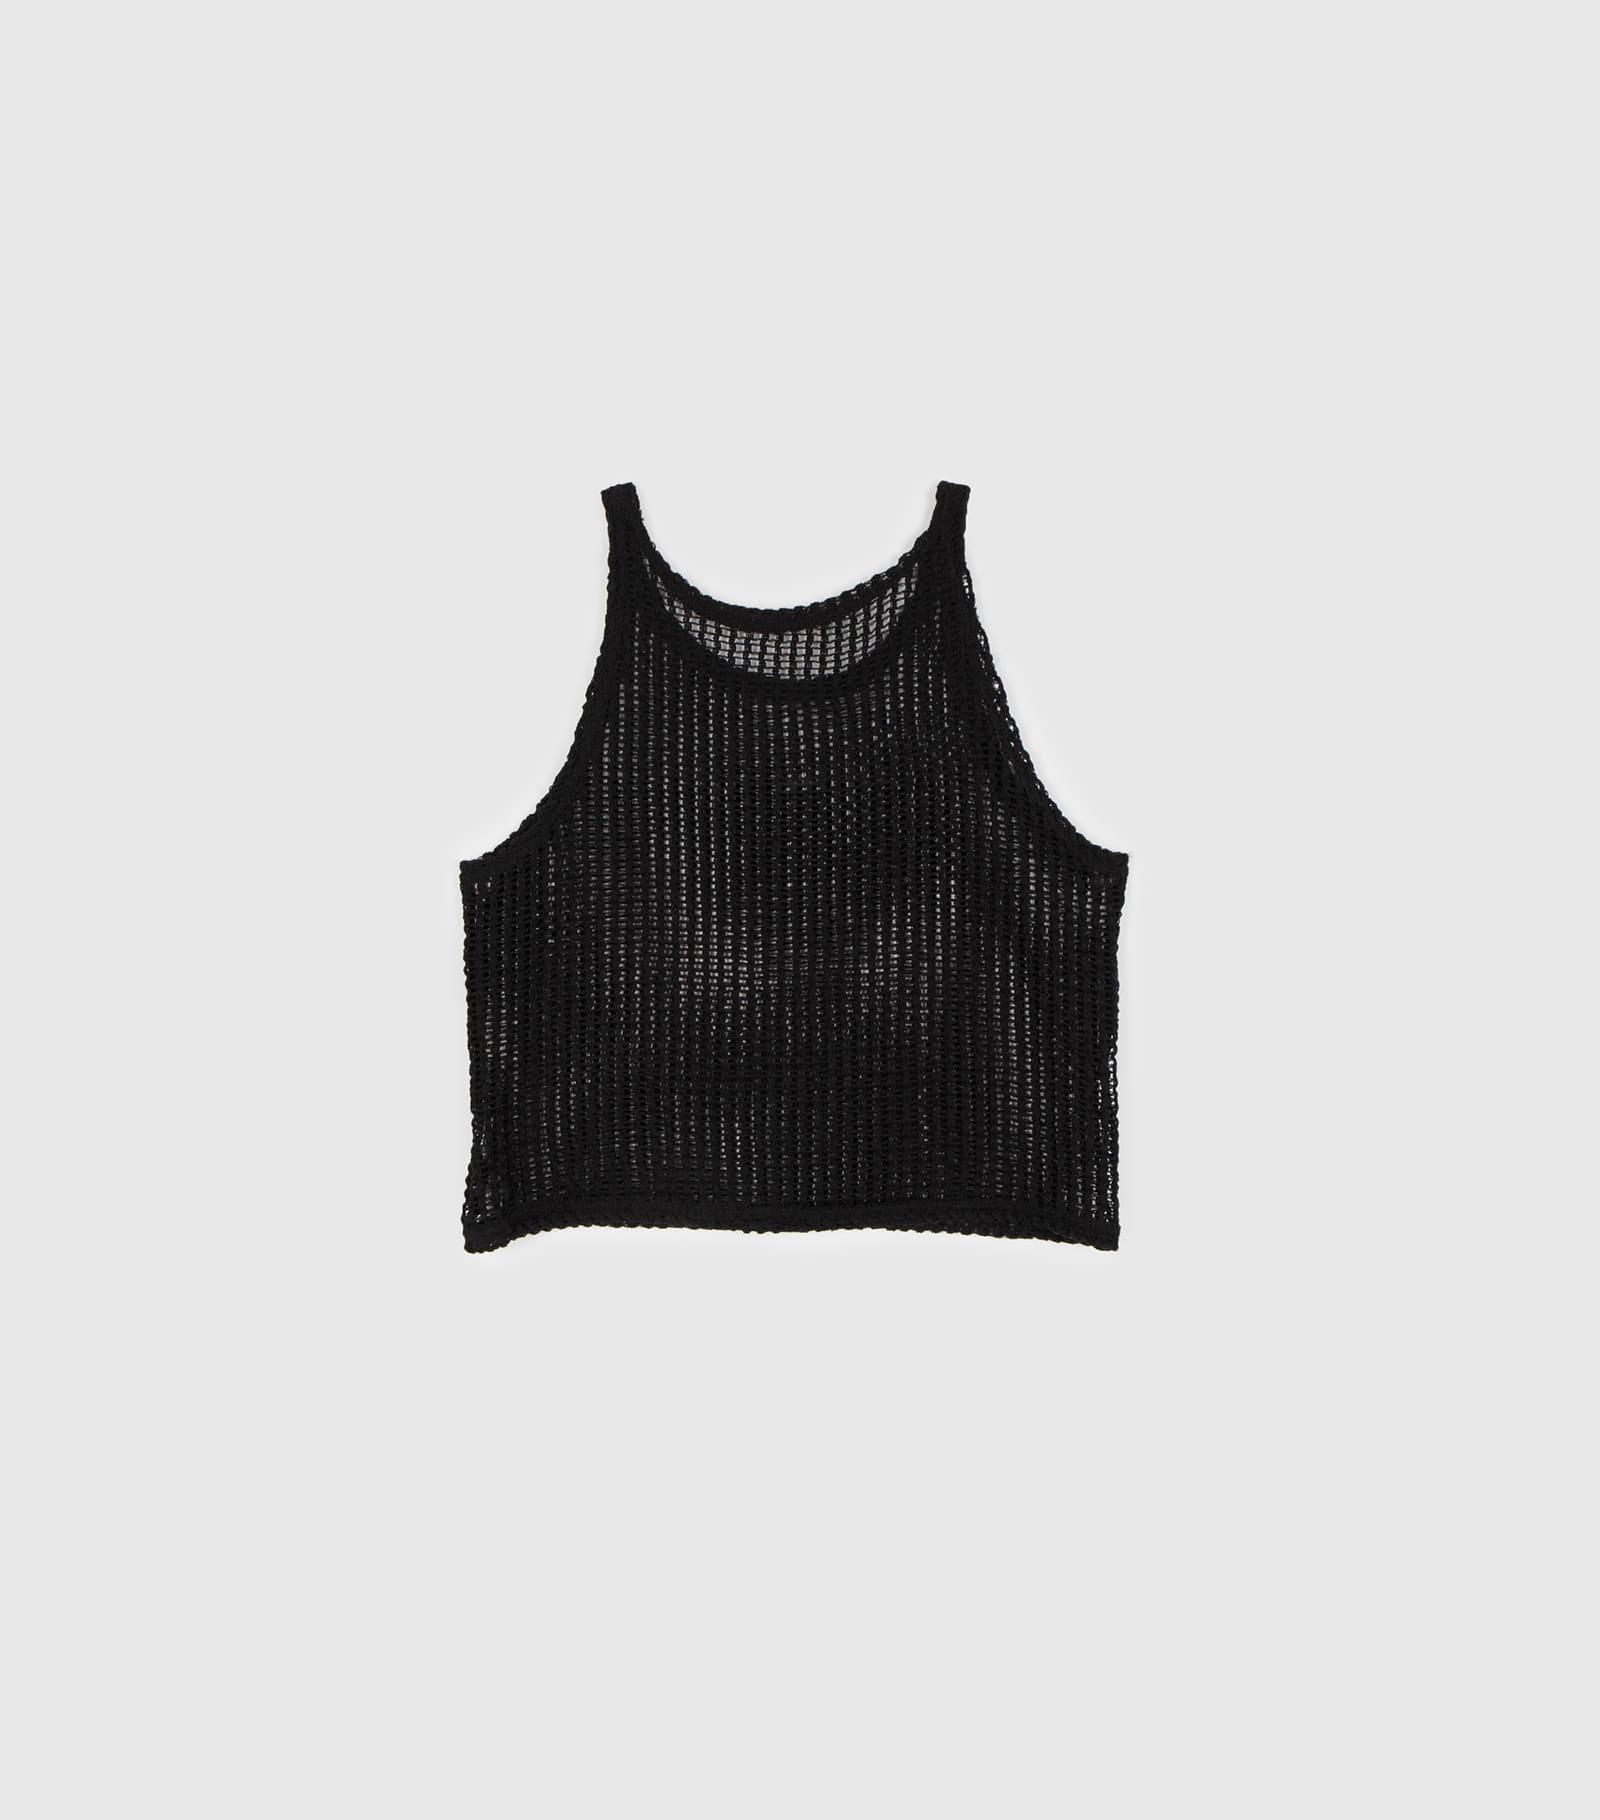 Like net sleeveless knit